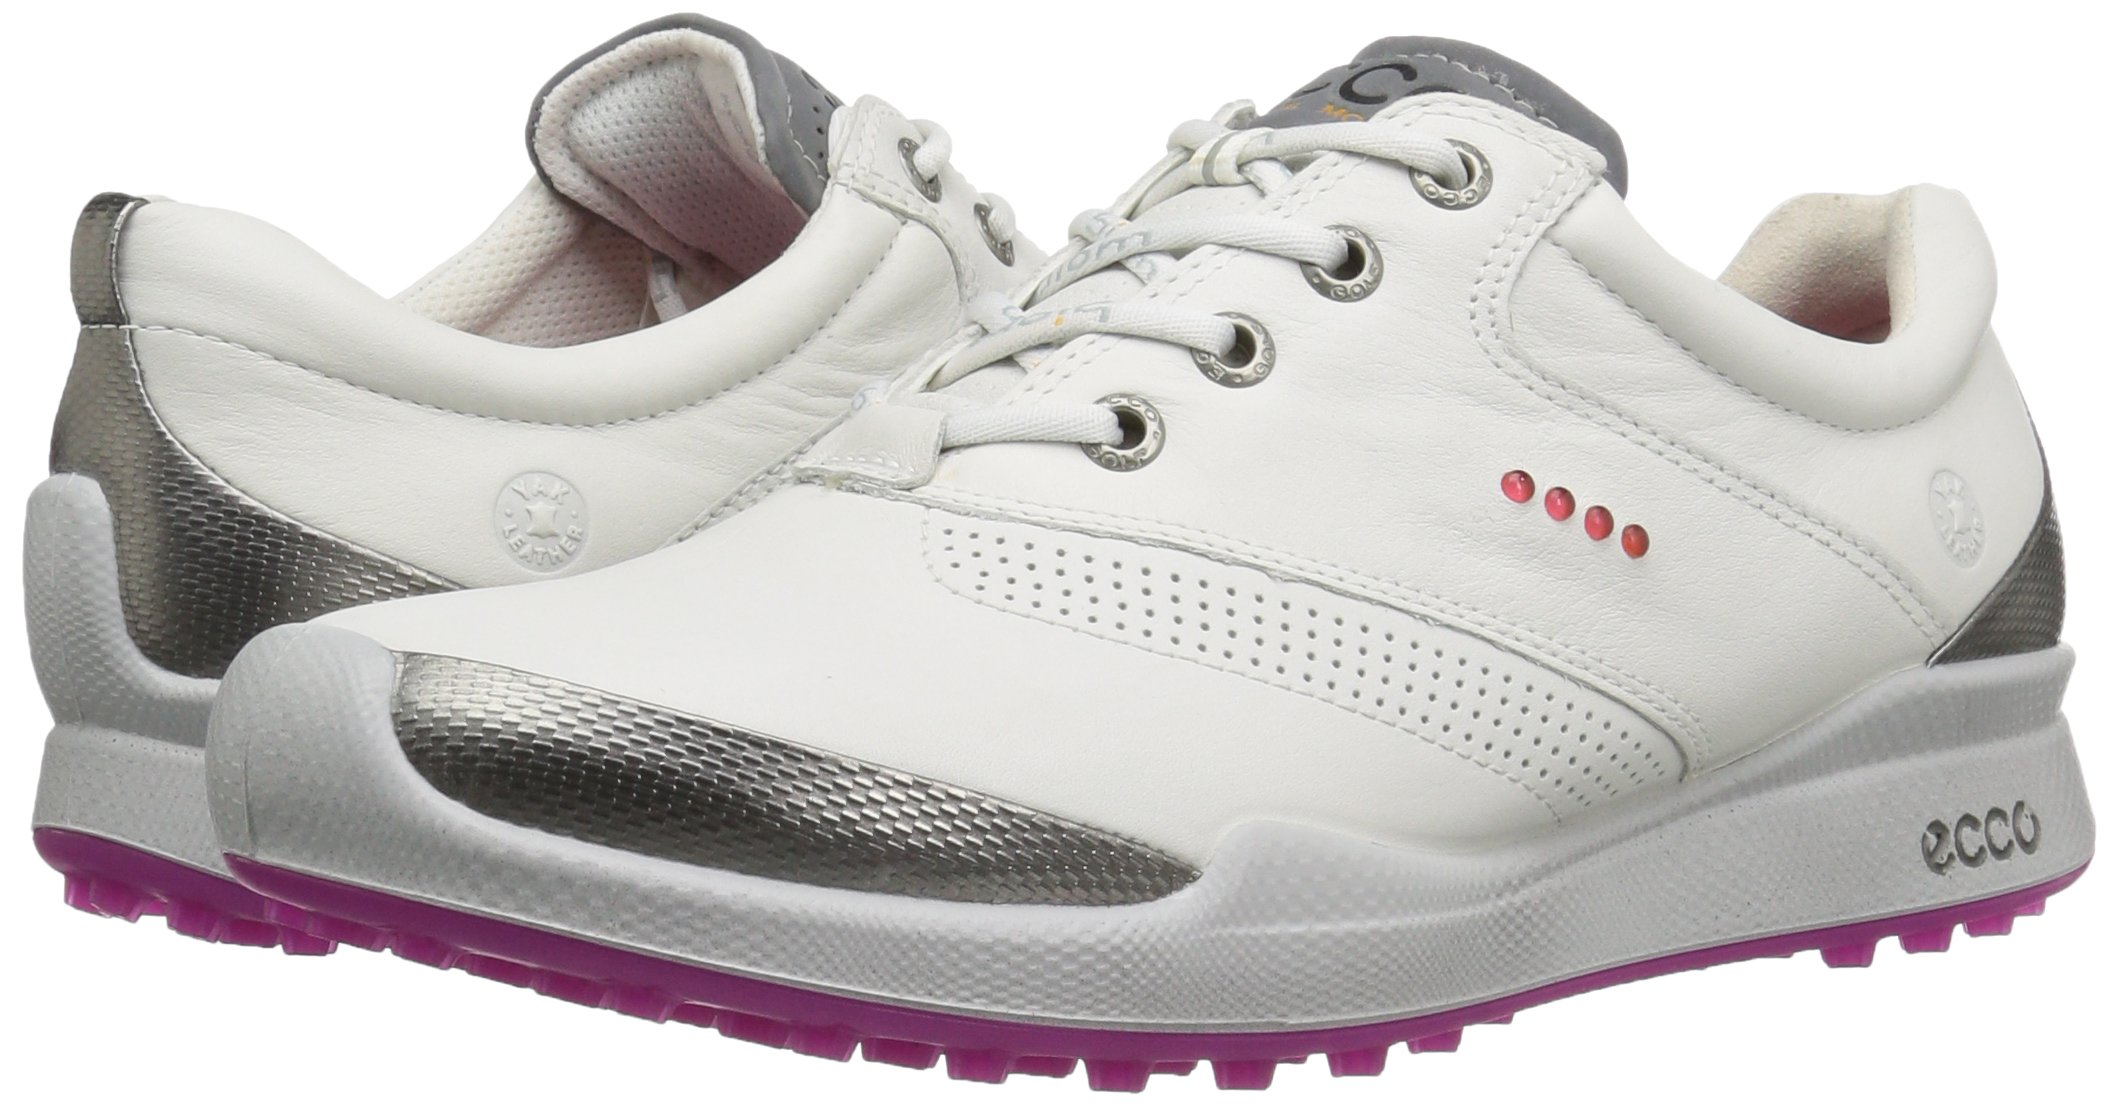 ECCO Women's Biom Hybrid Hydromax Golf Shoe, White/Candy, 39 EU/8-8.5 M US by ECCO (Image #6)